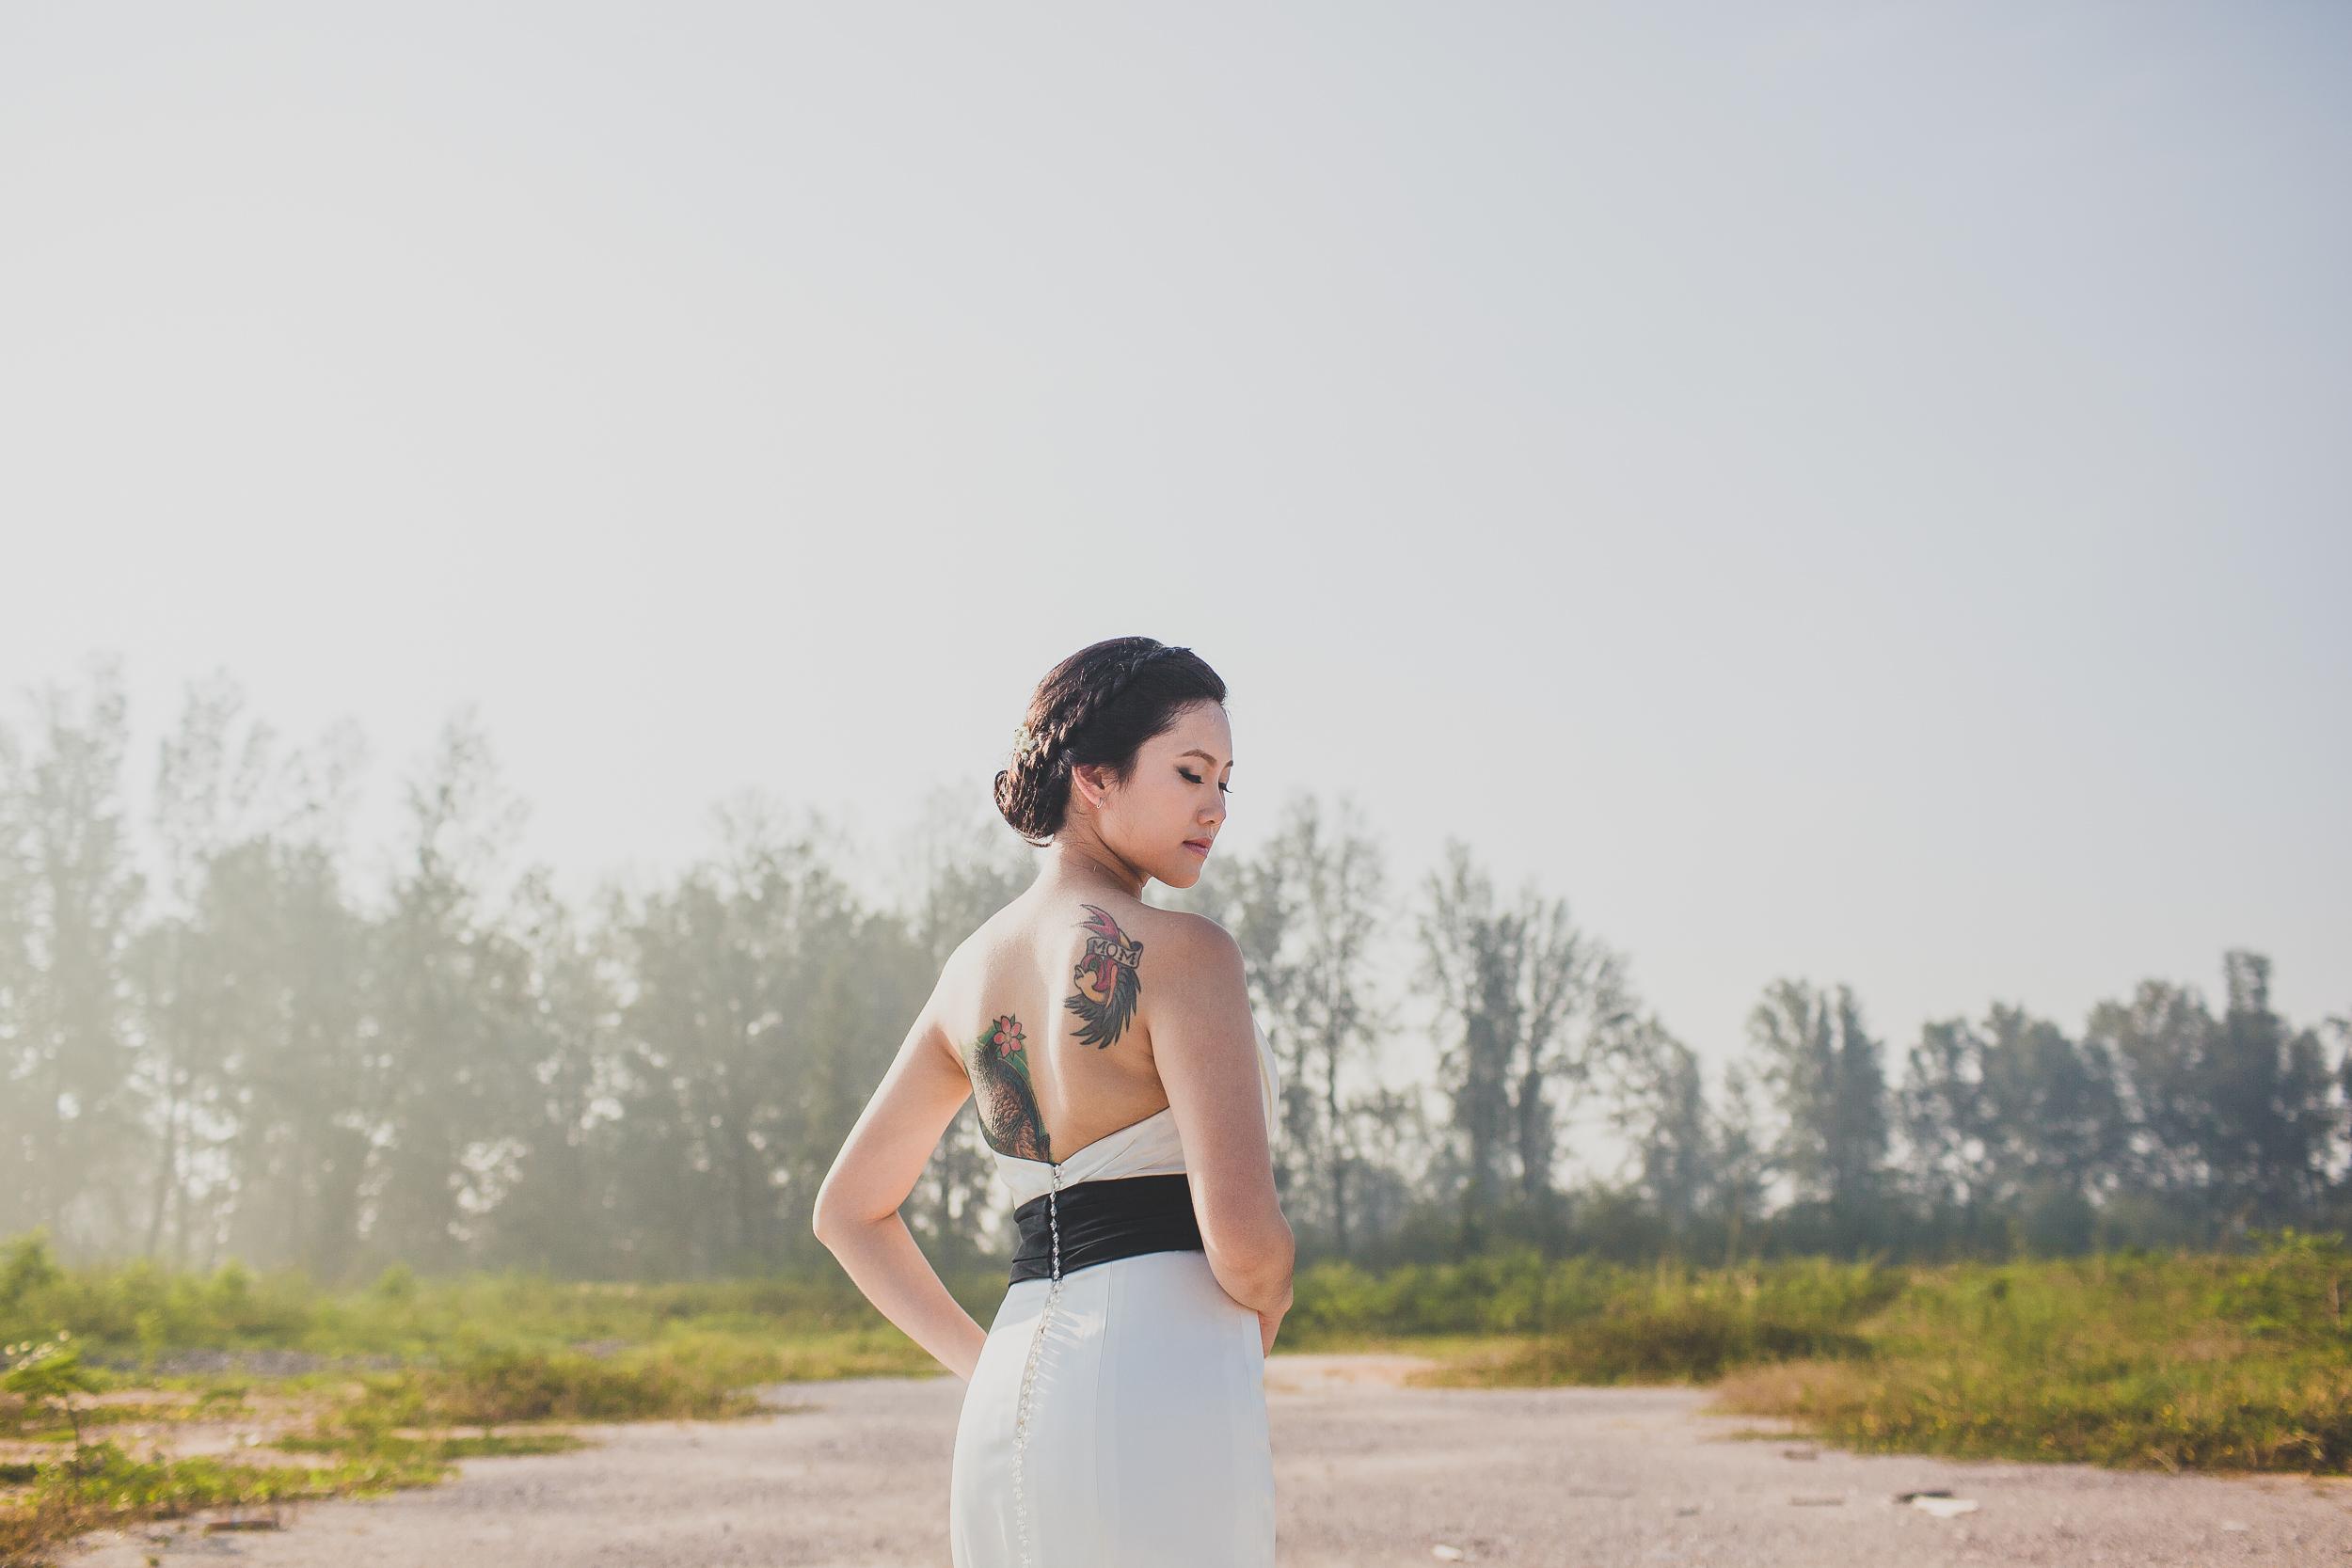 Singapore+Pre+Wedding+Photographer+Ziyang+Clara-0016.jpg